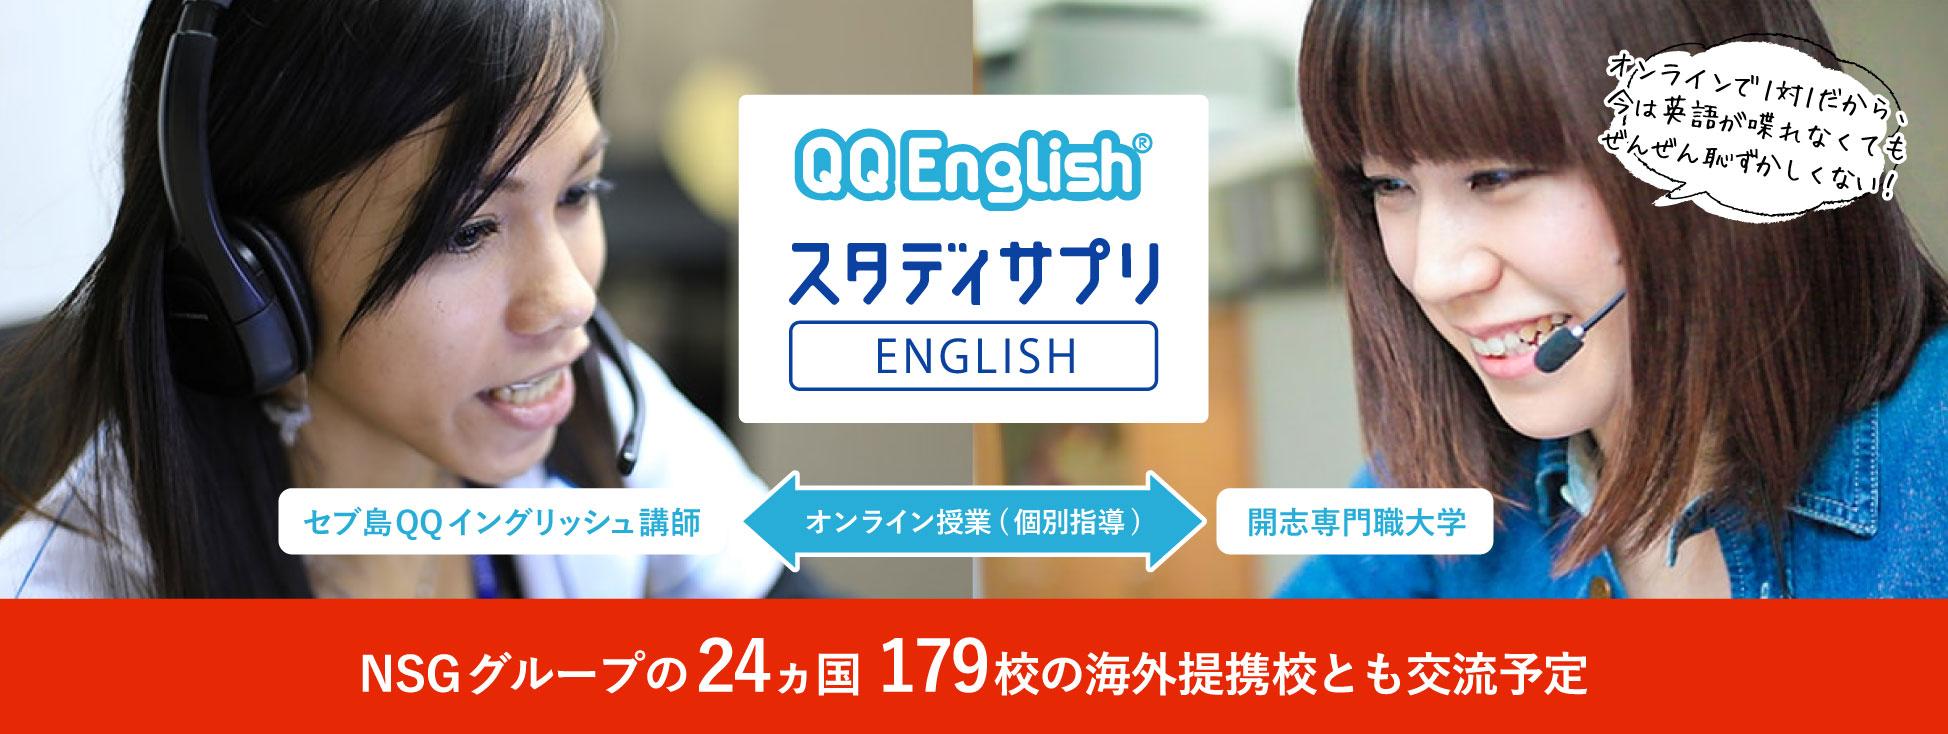 QQ English スタディサプリ ENGLISH